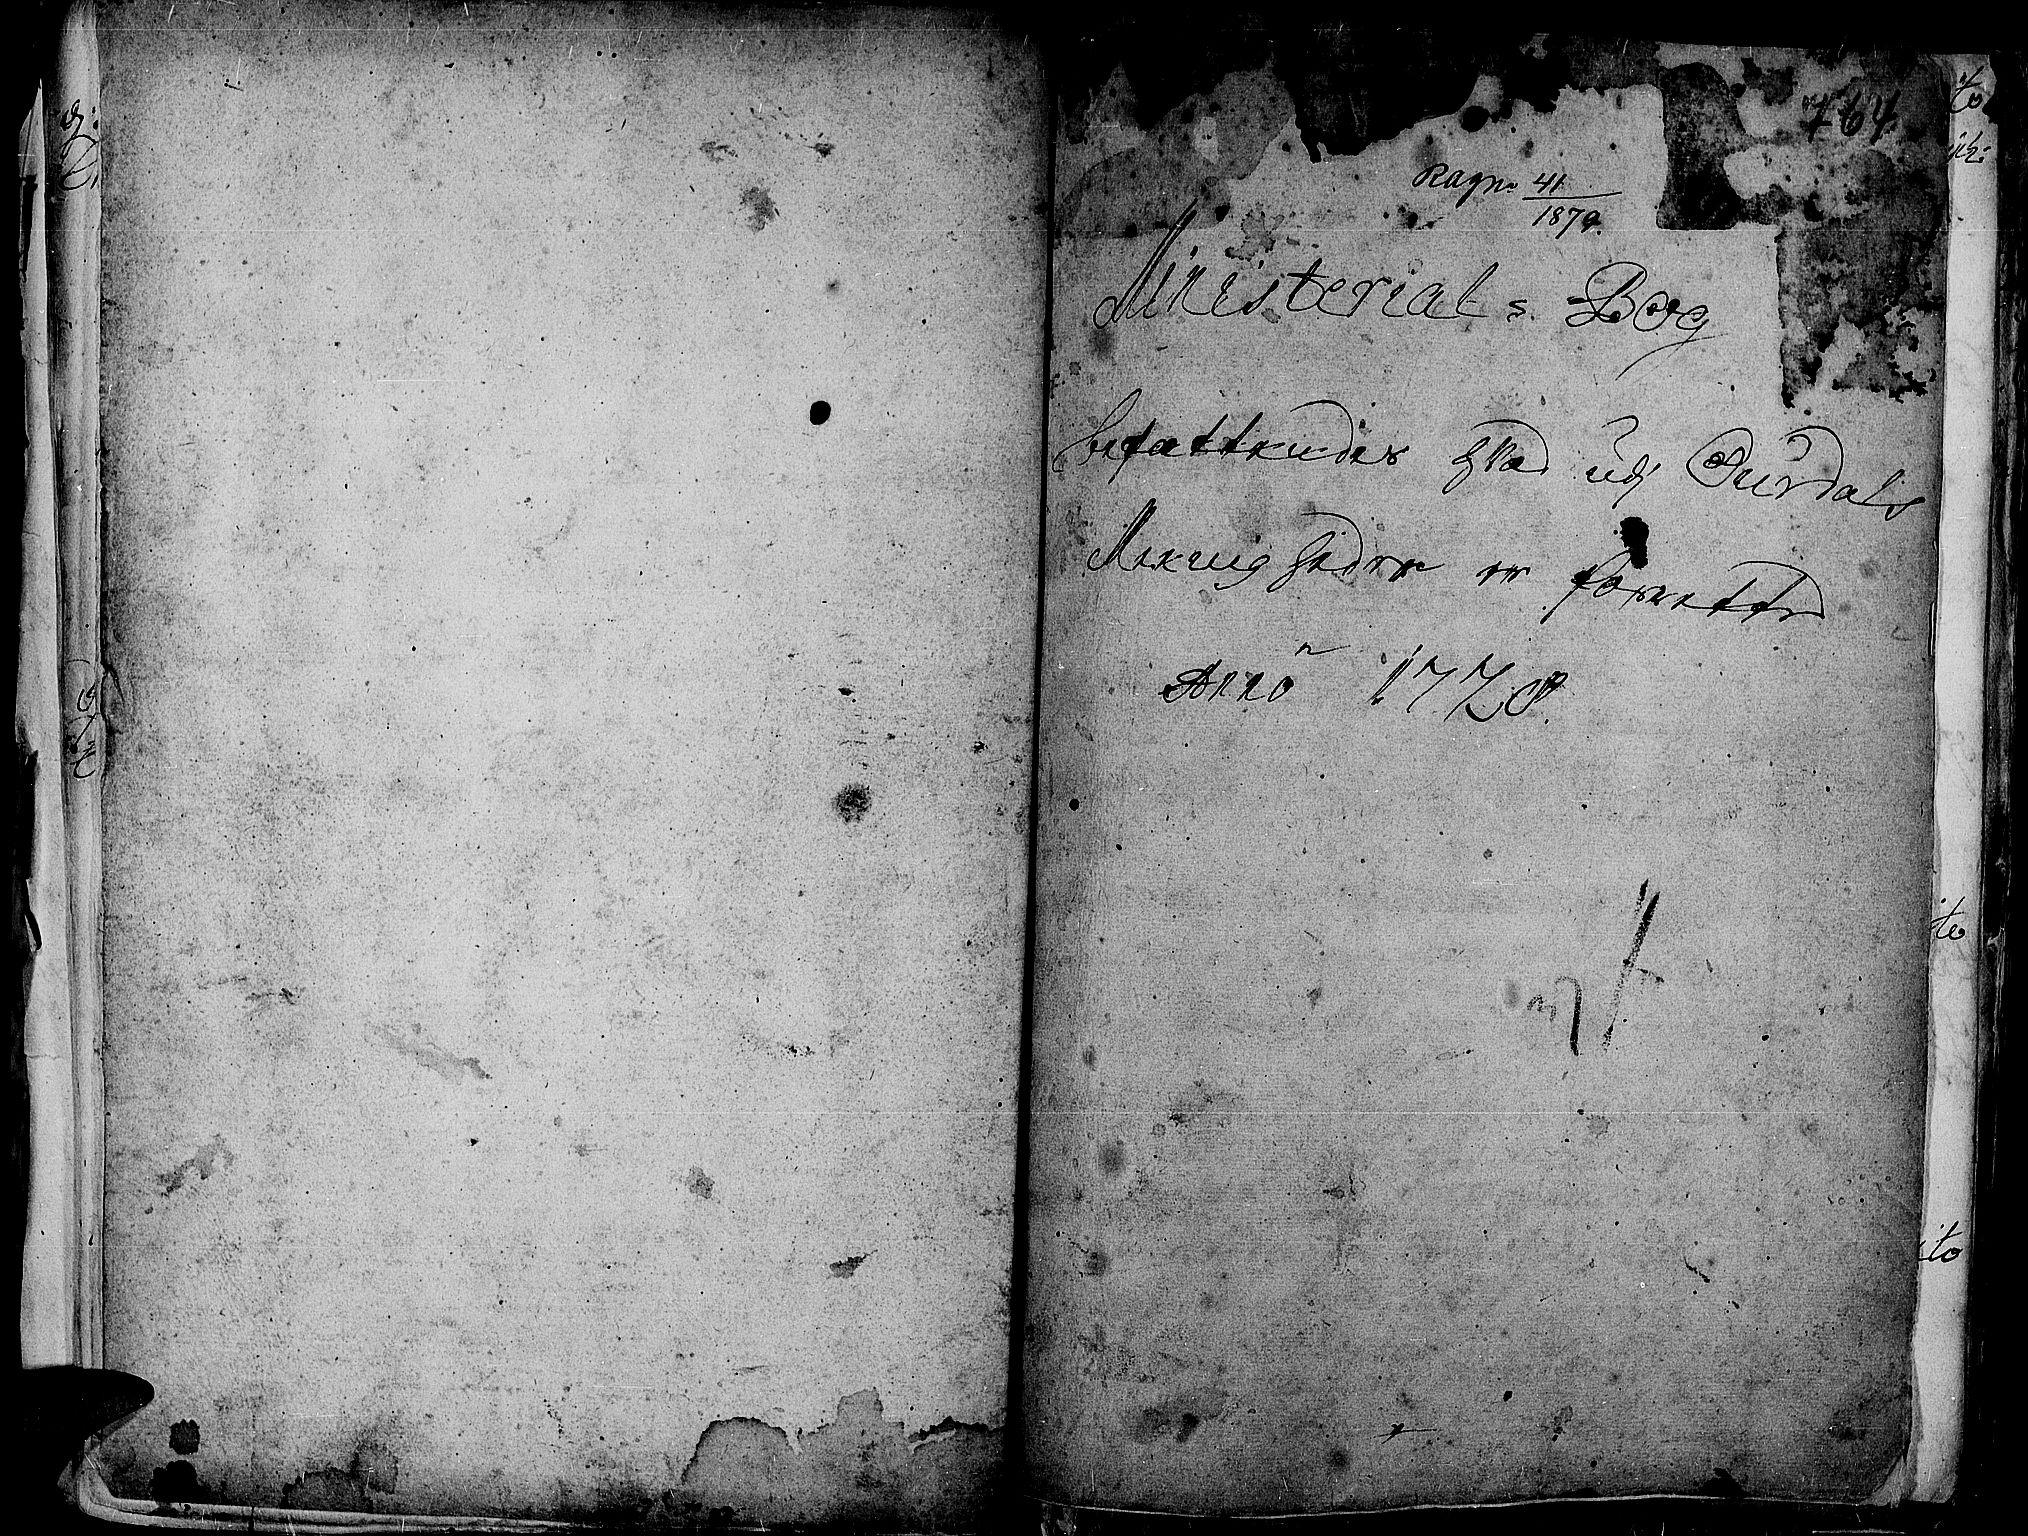 SAH, Aurdal prestekontor, Ministerialbok nr. 1-3, 1692-1730, s. 764